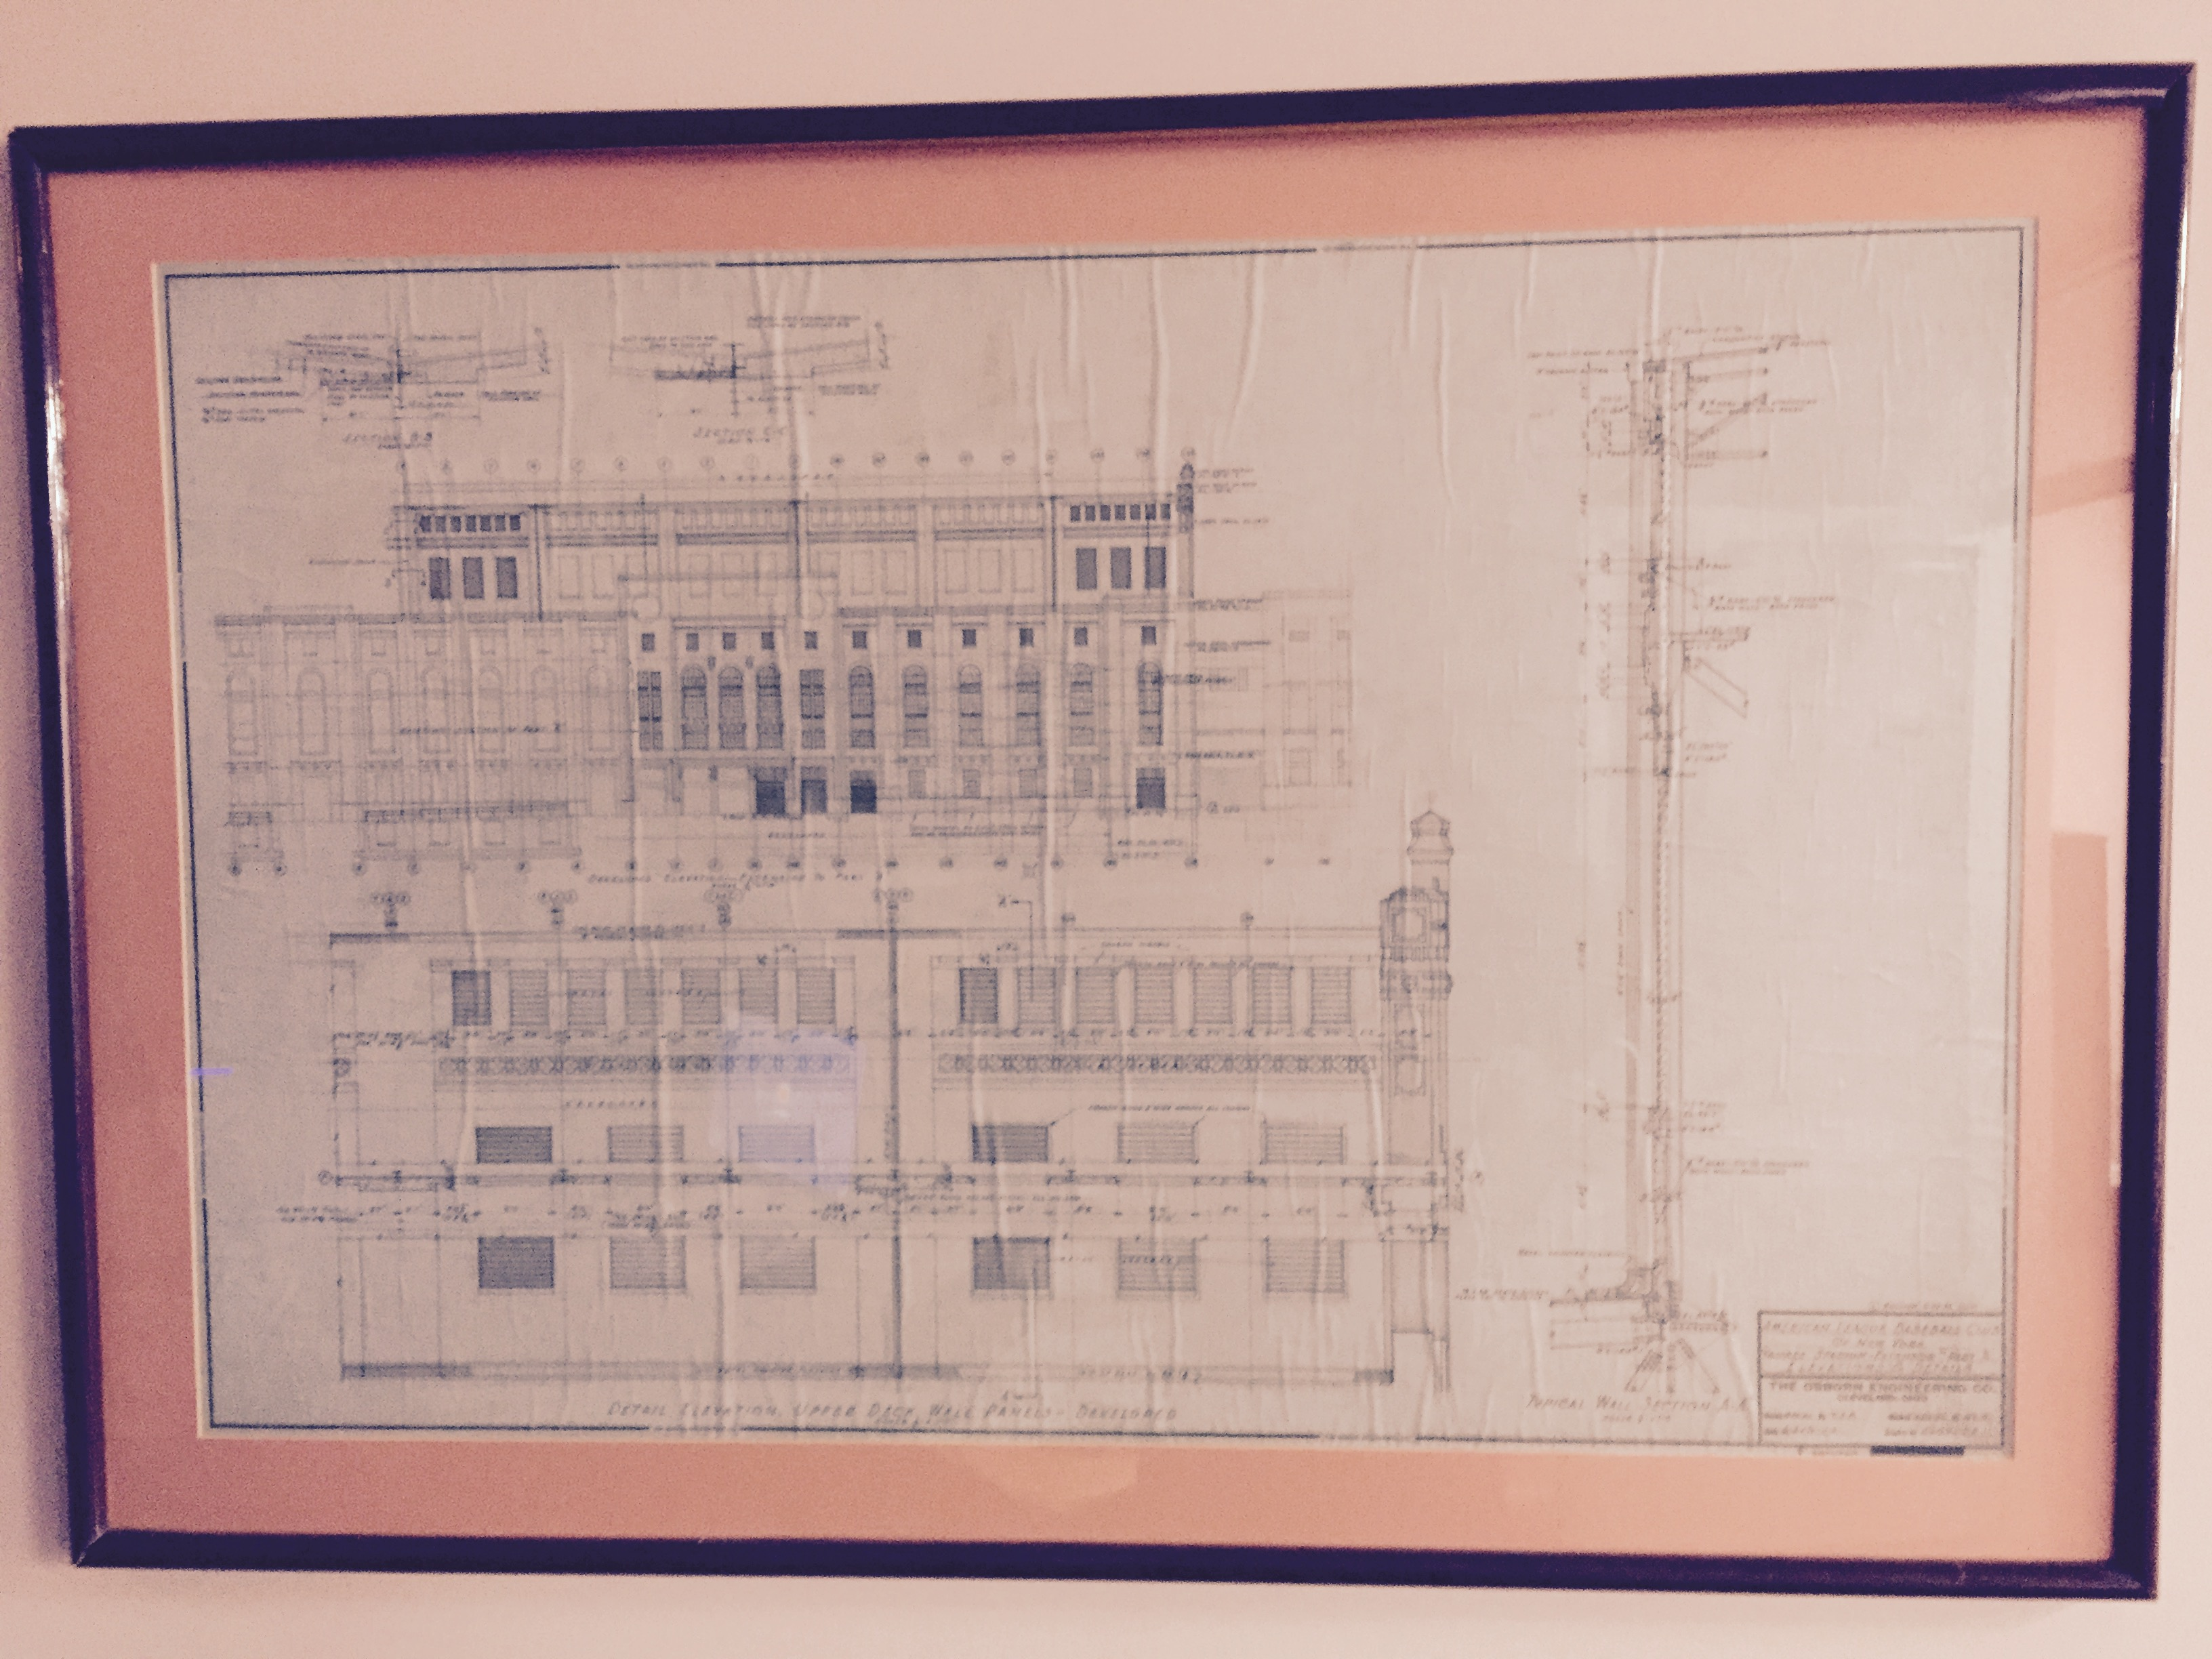 3264x2448 1928 Yankee Stadium Ink On Linen Blueprint Of Outside Facade